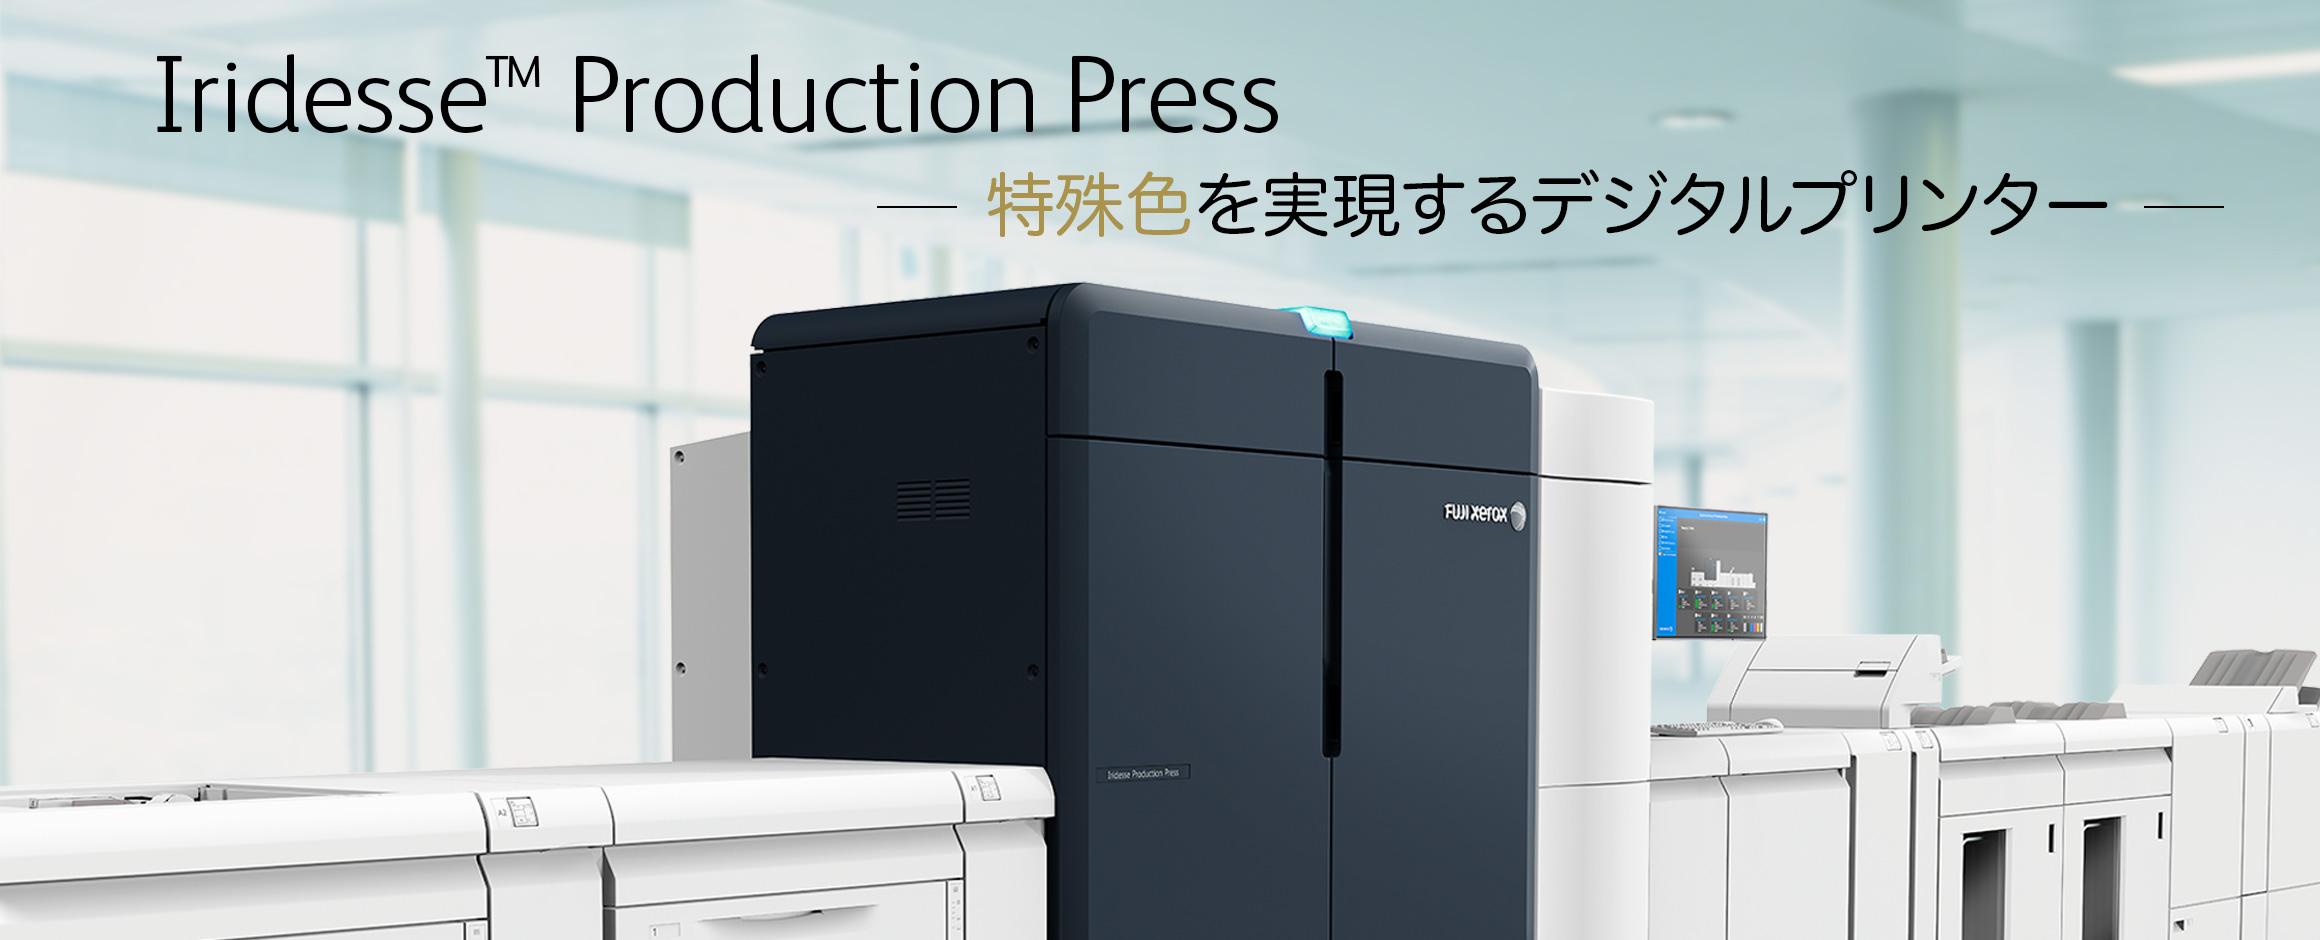 Iridesse™ Production Press 特殊色を実現するデジタルプリンター